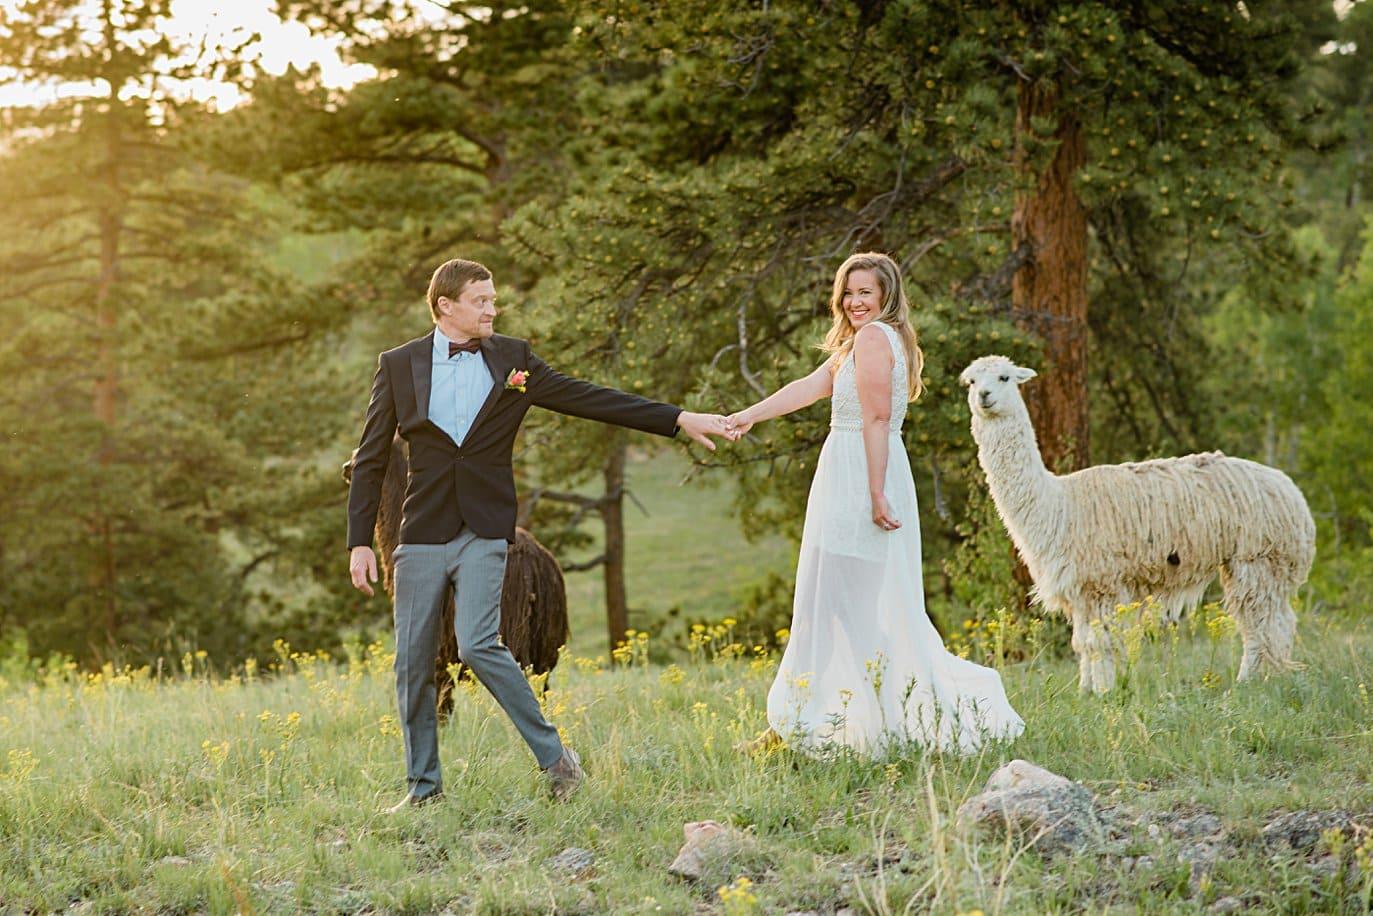 bride and groom walk through wildflower field with alpacas at Golden elopement by Golden elopement photographer Jennie Crate